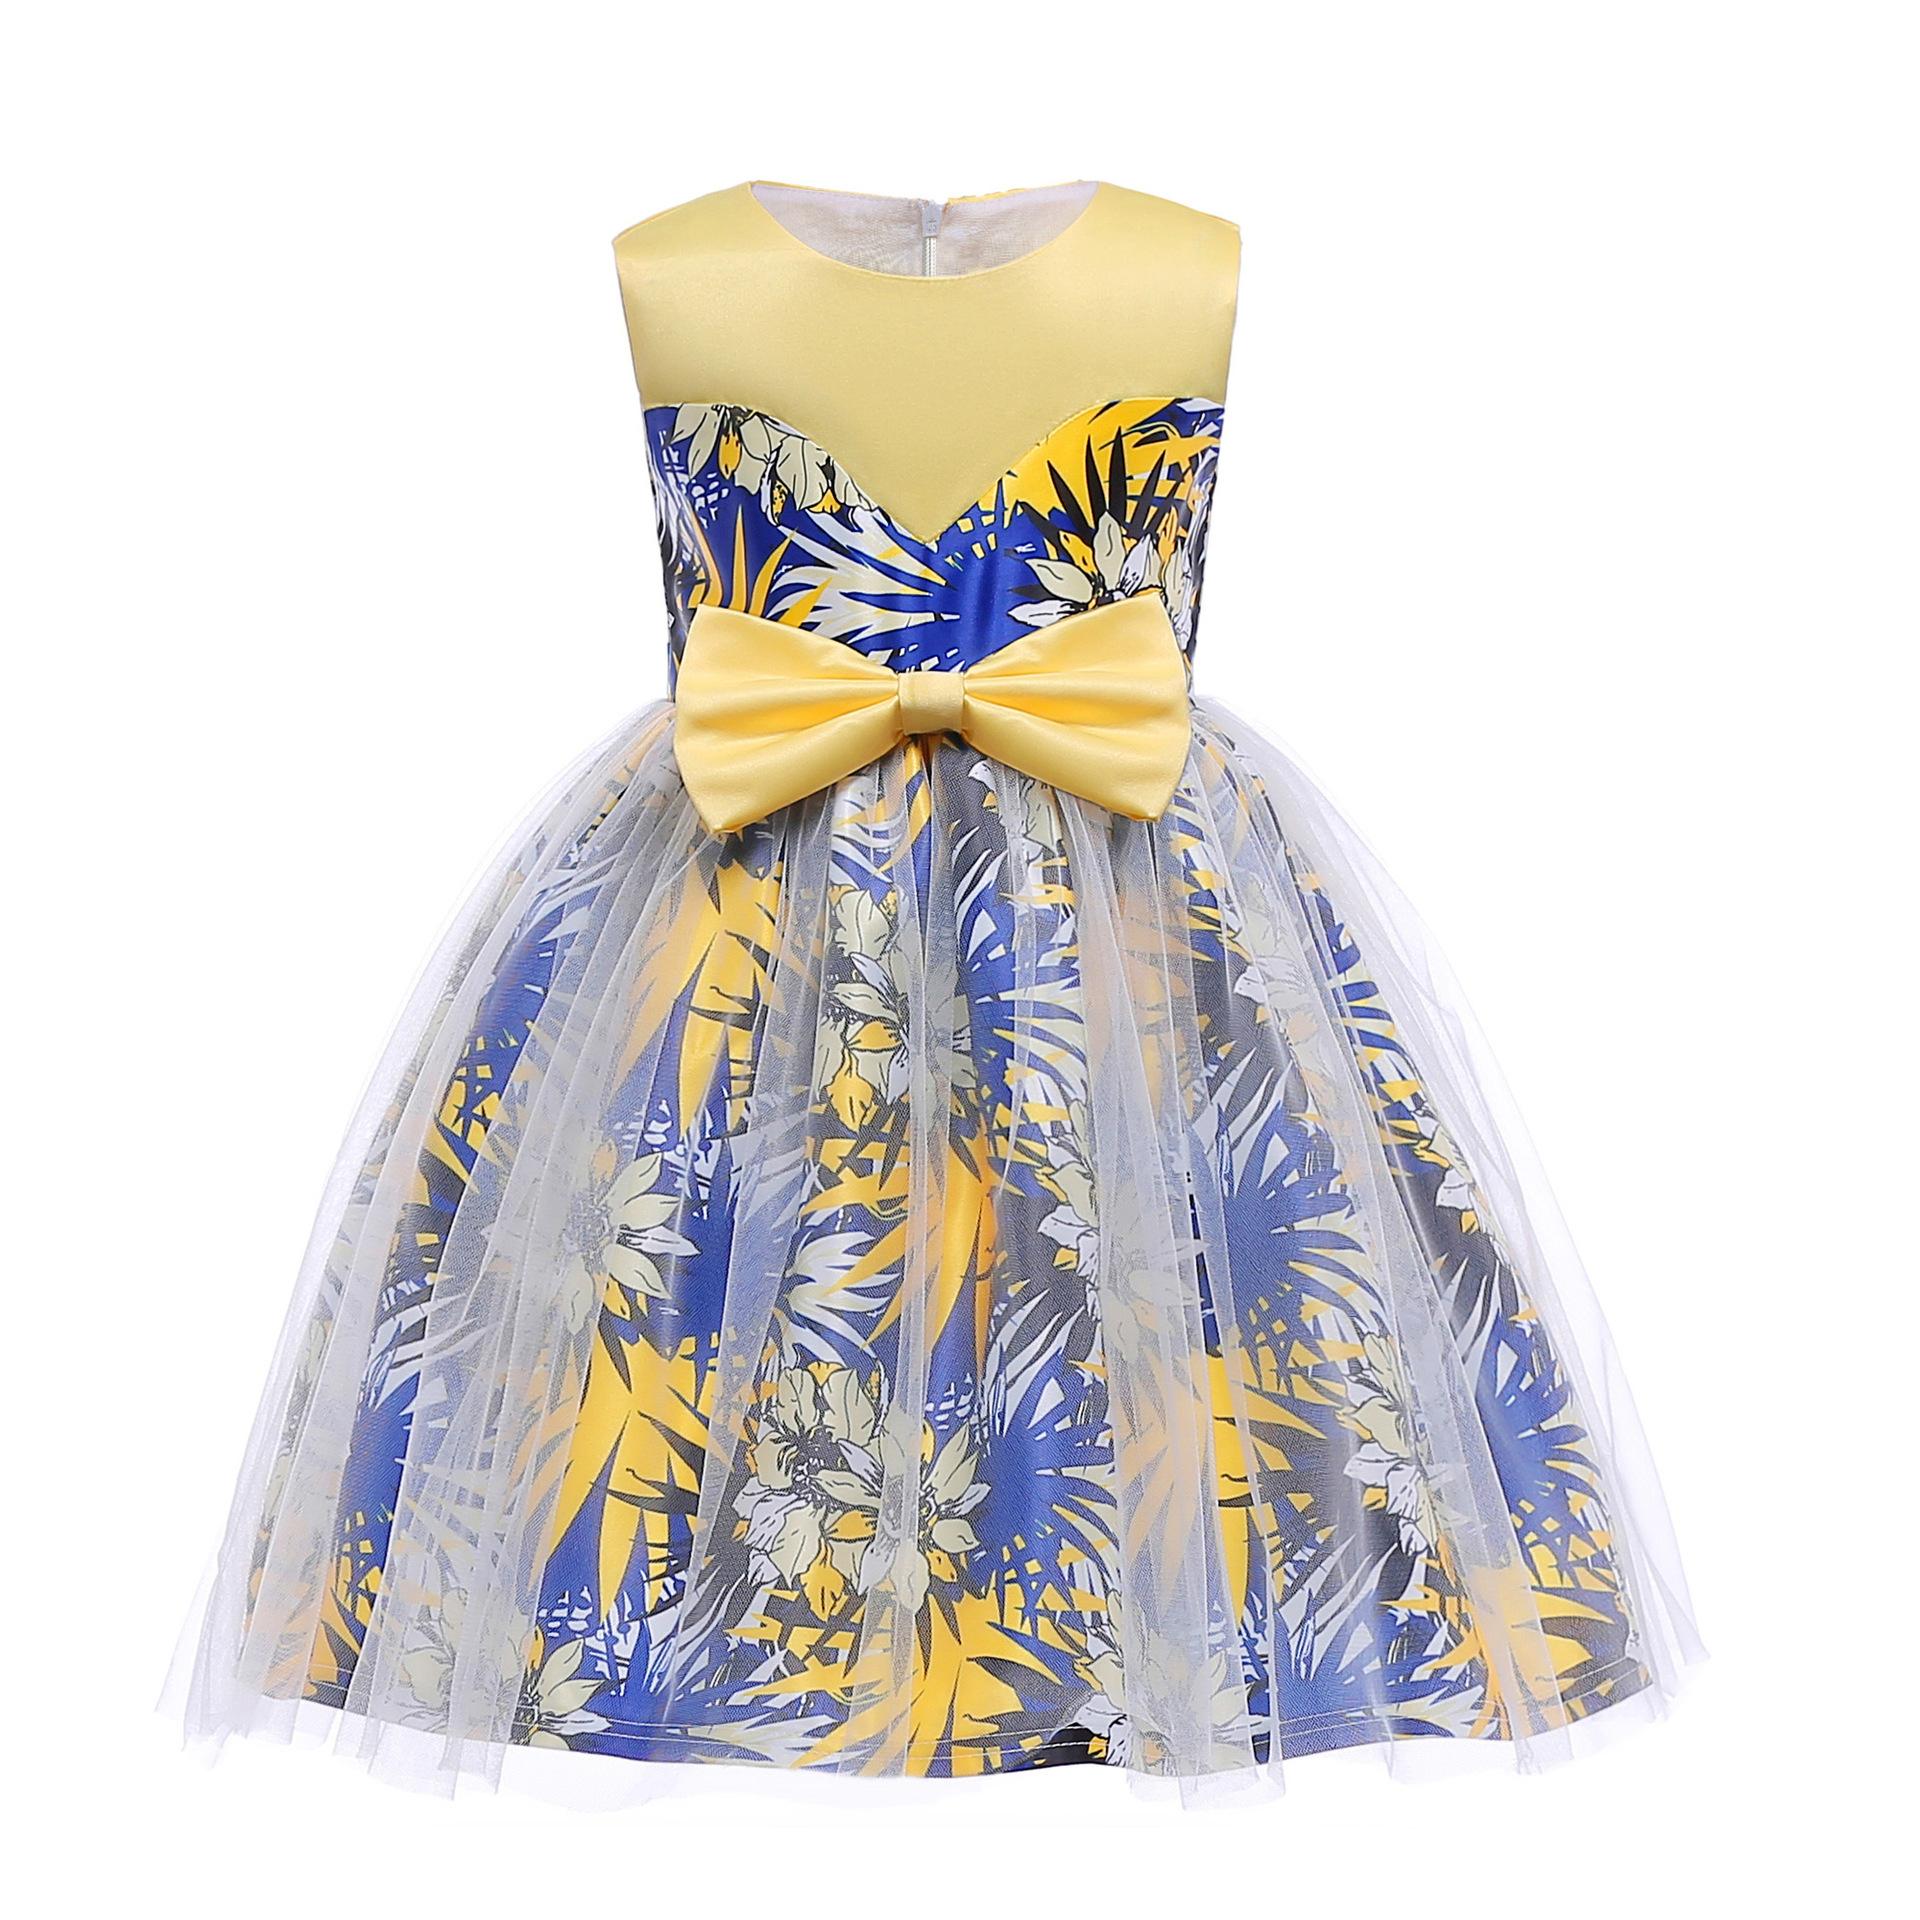 Botanical Print Bowknot Decorated Sleeveless Dress